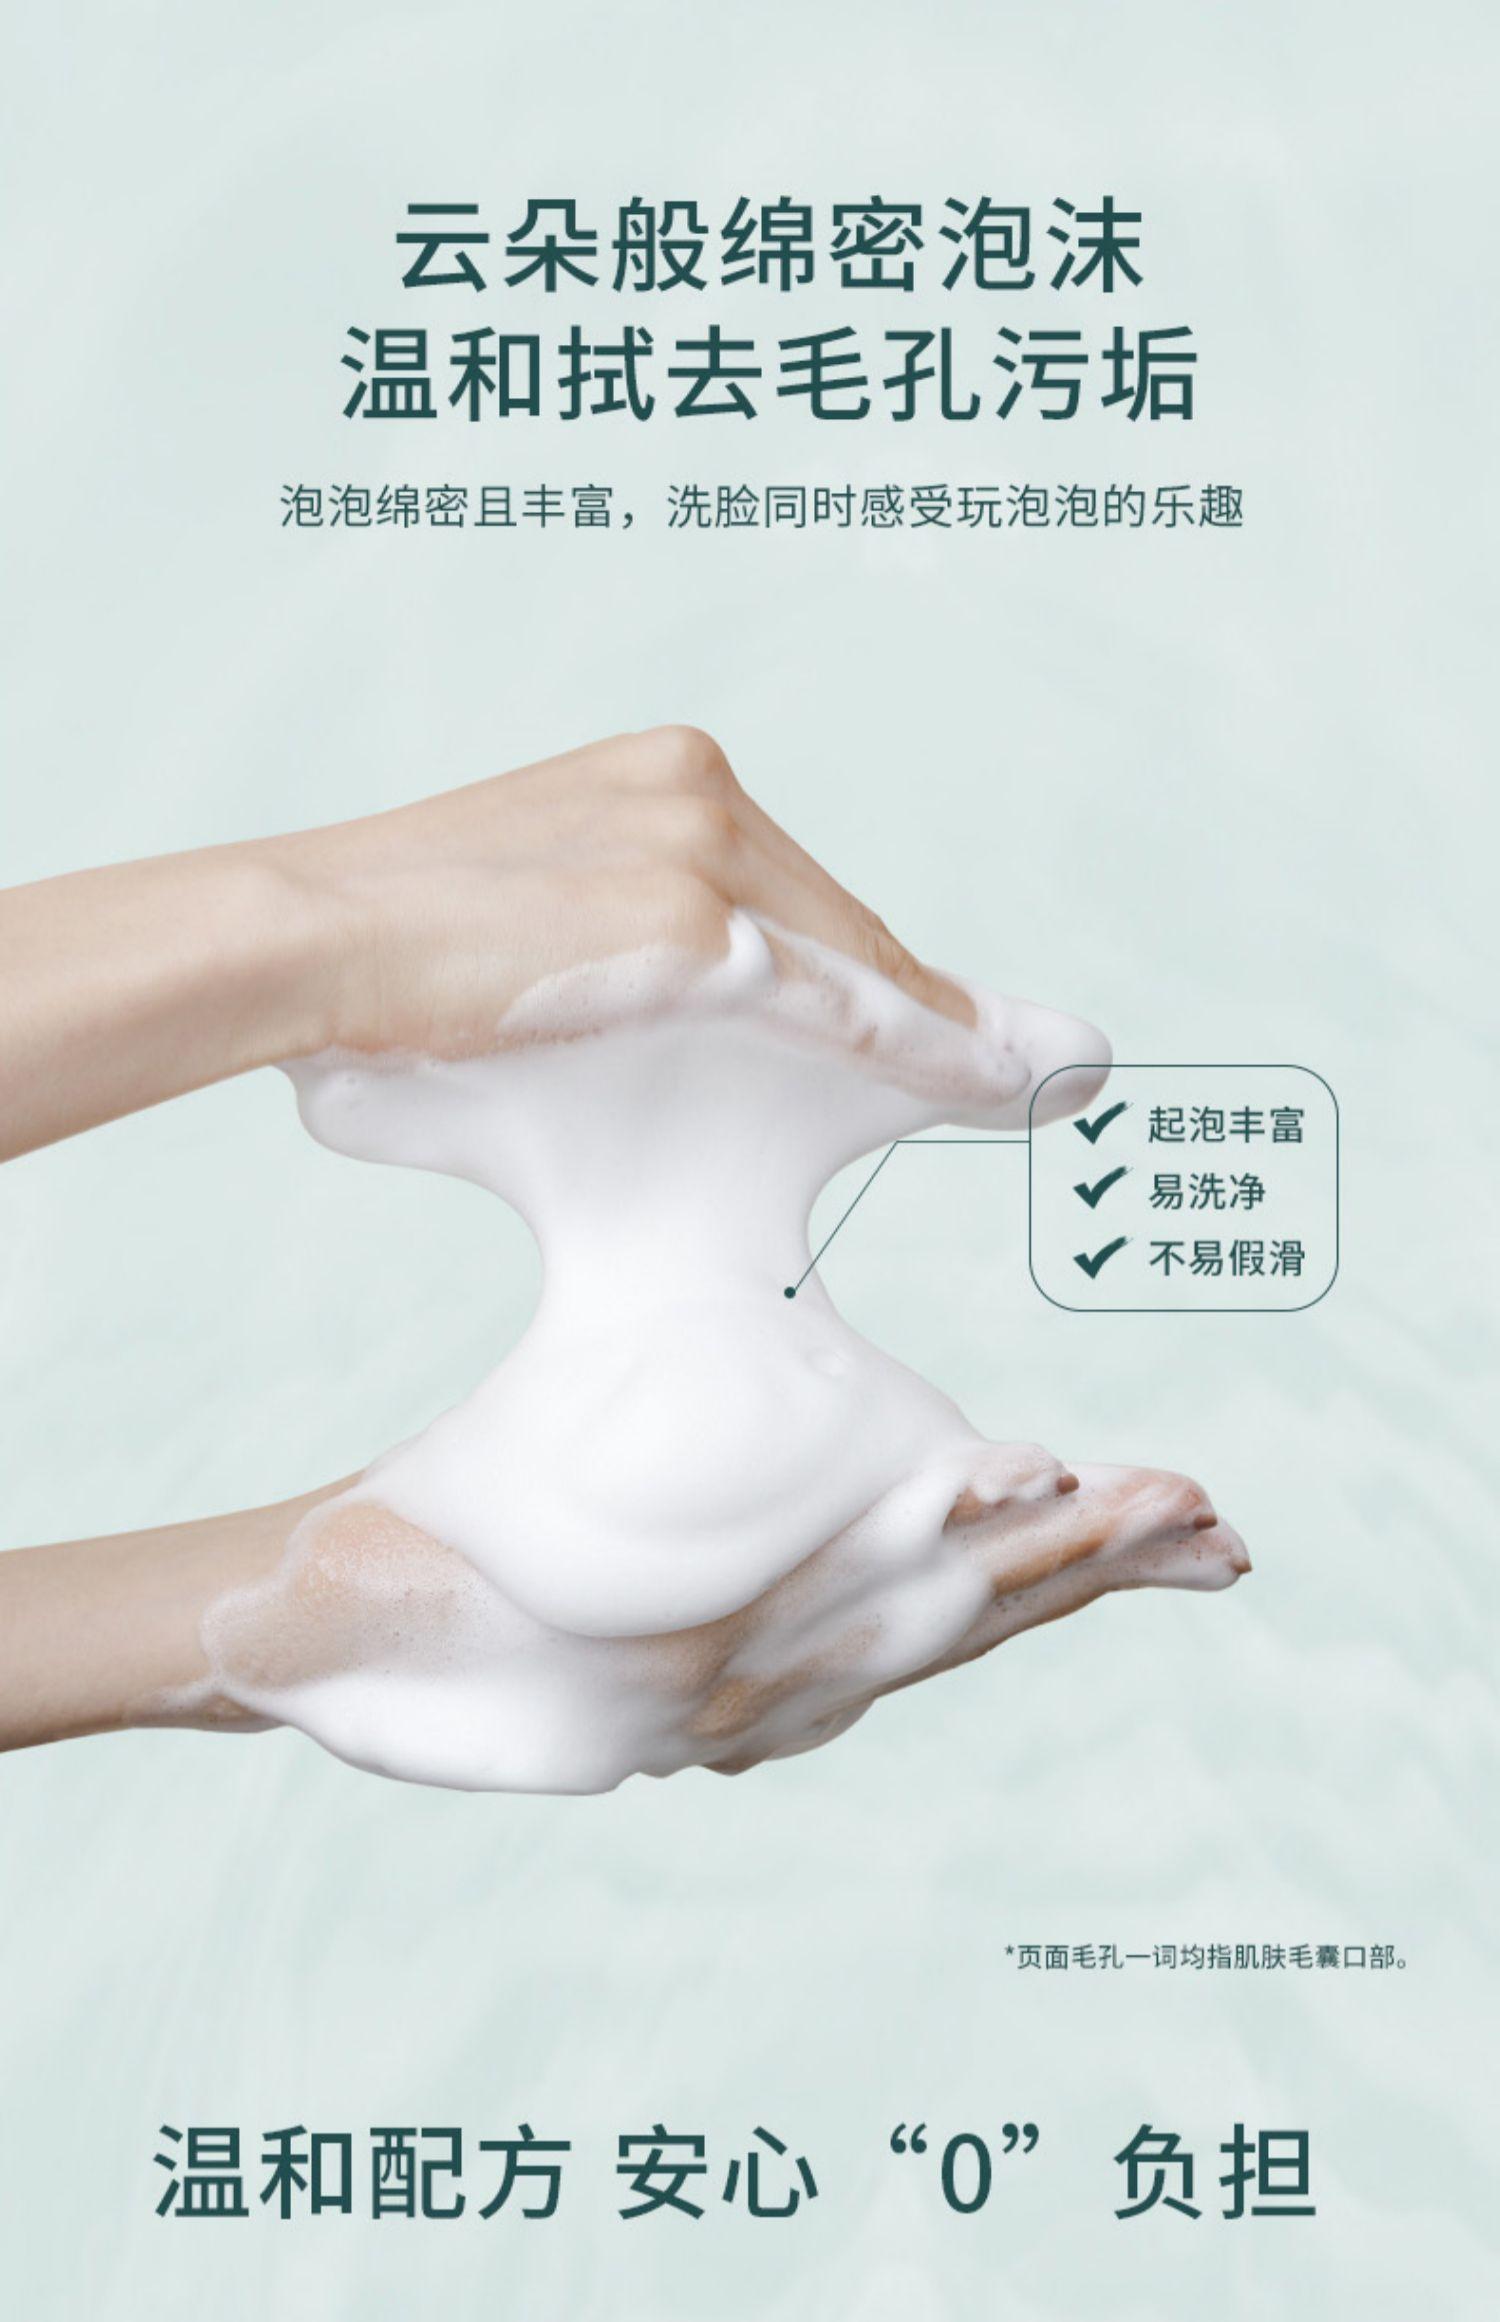 【unny】官旗氨基酸洗面奶120g8